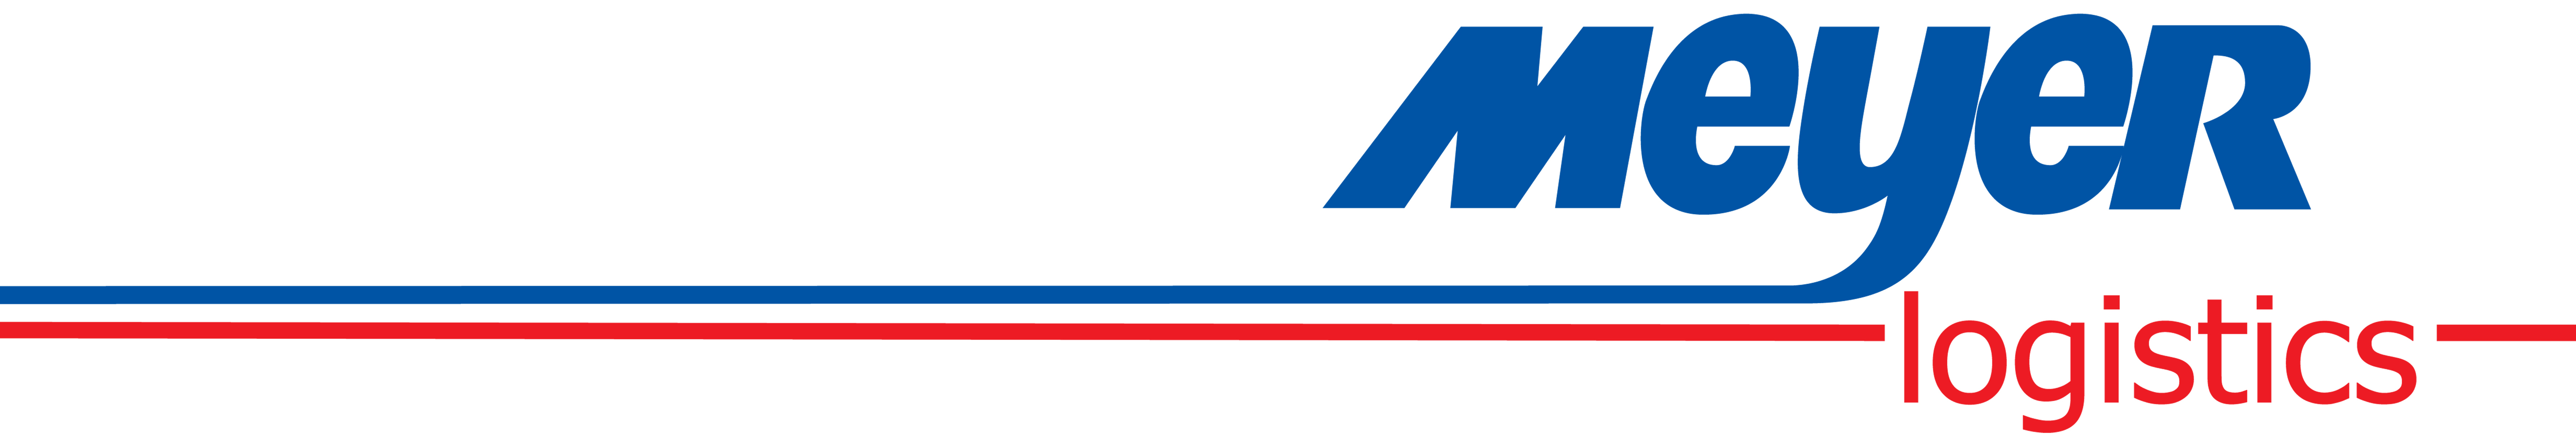 Meyer logistics Logo